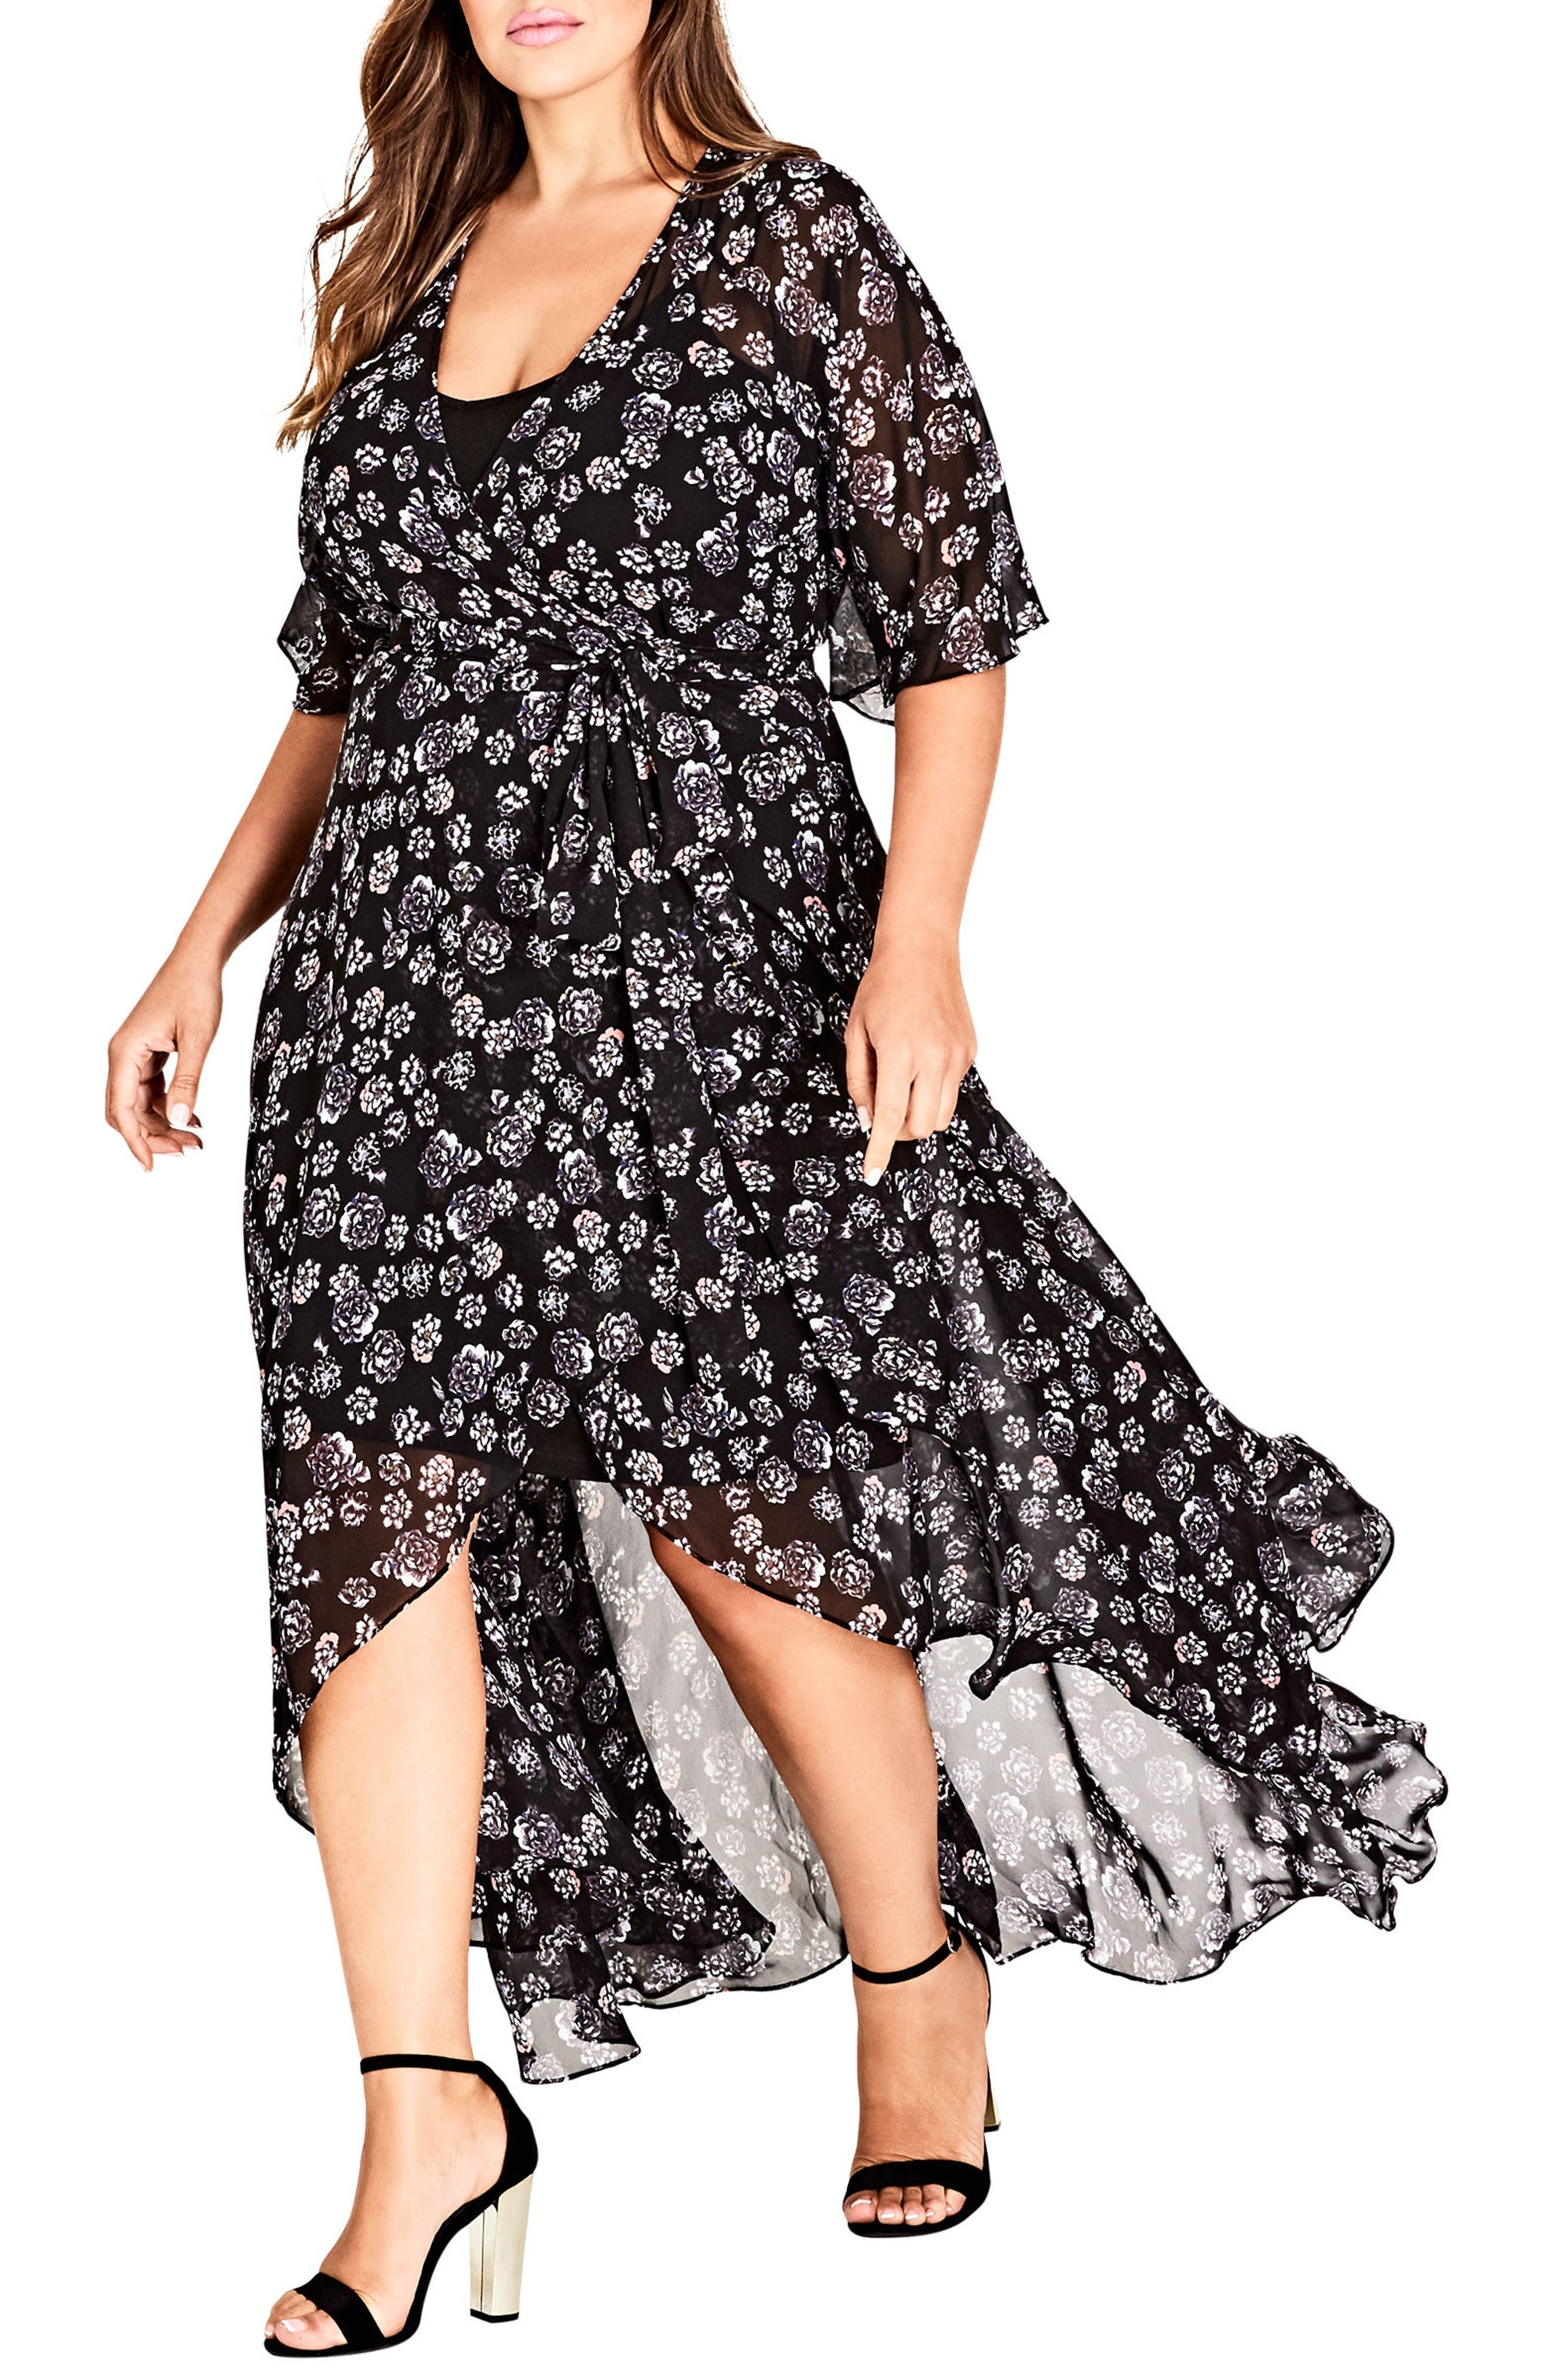 Alternate Image 1 Selected - City Chic Mini Flower Maxi Dress (Plus Size)